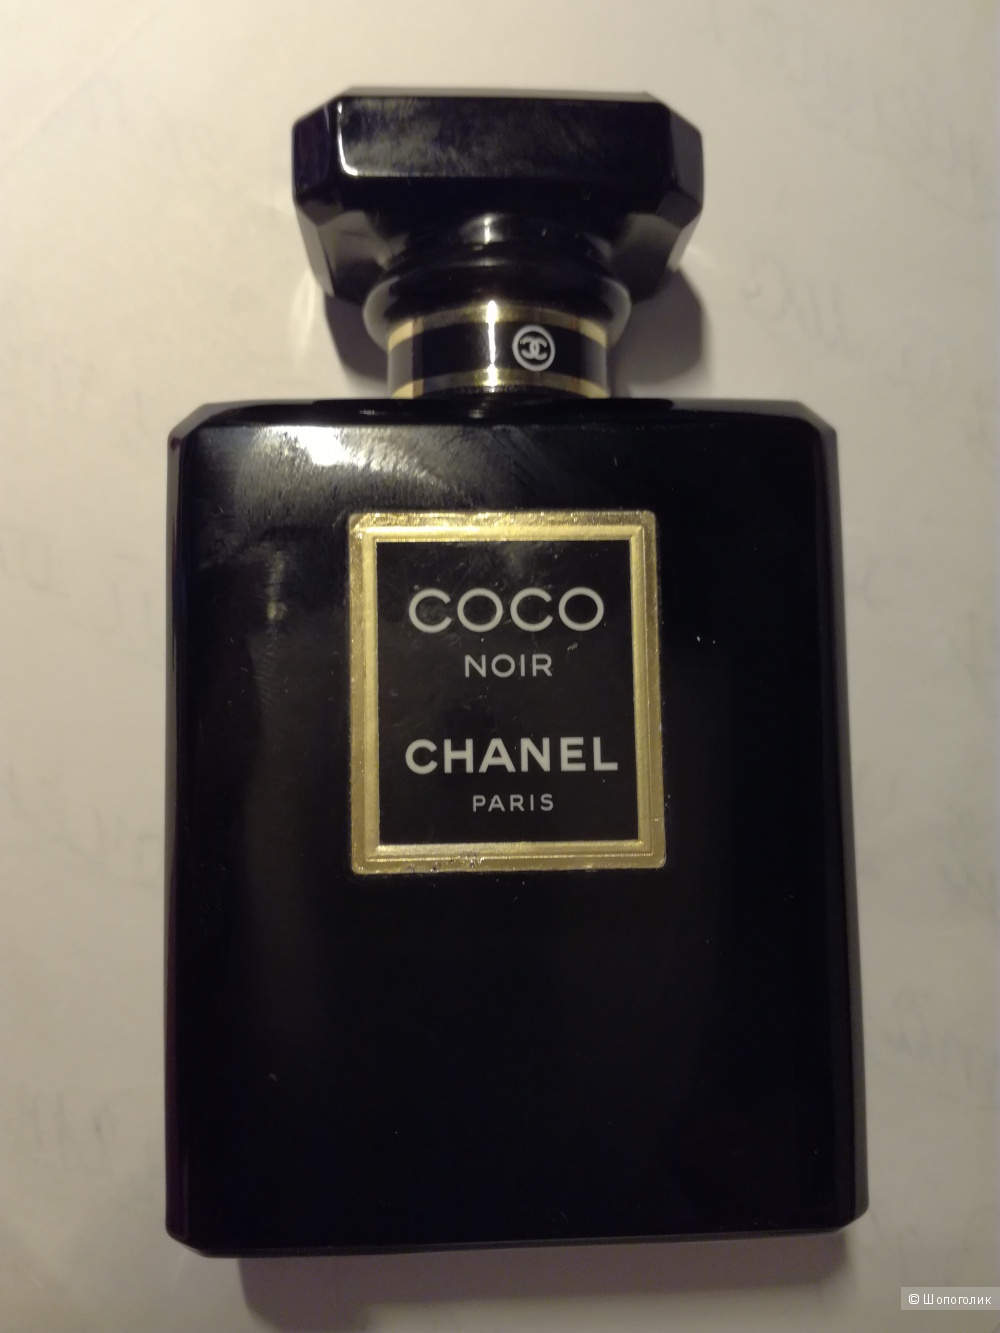 Coco Noir Chanel парфюмерная вода.